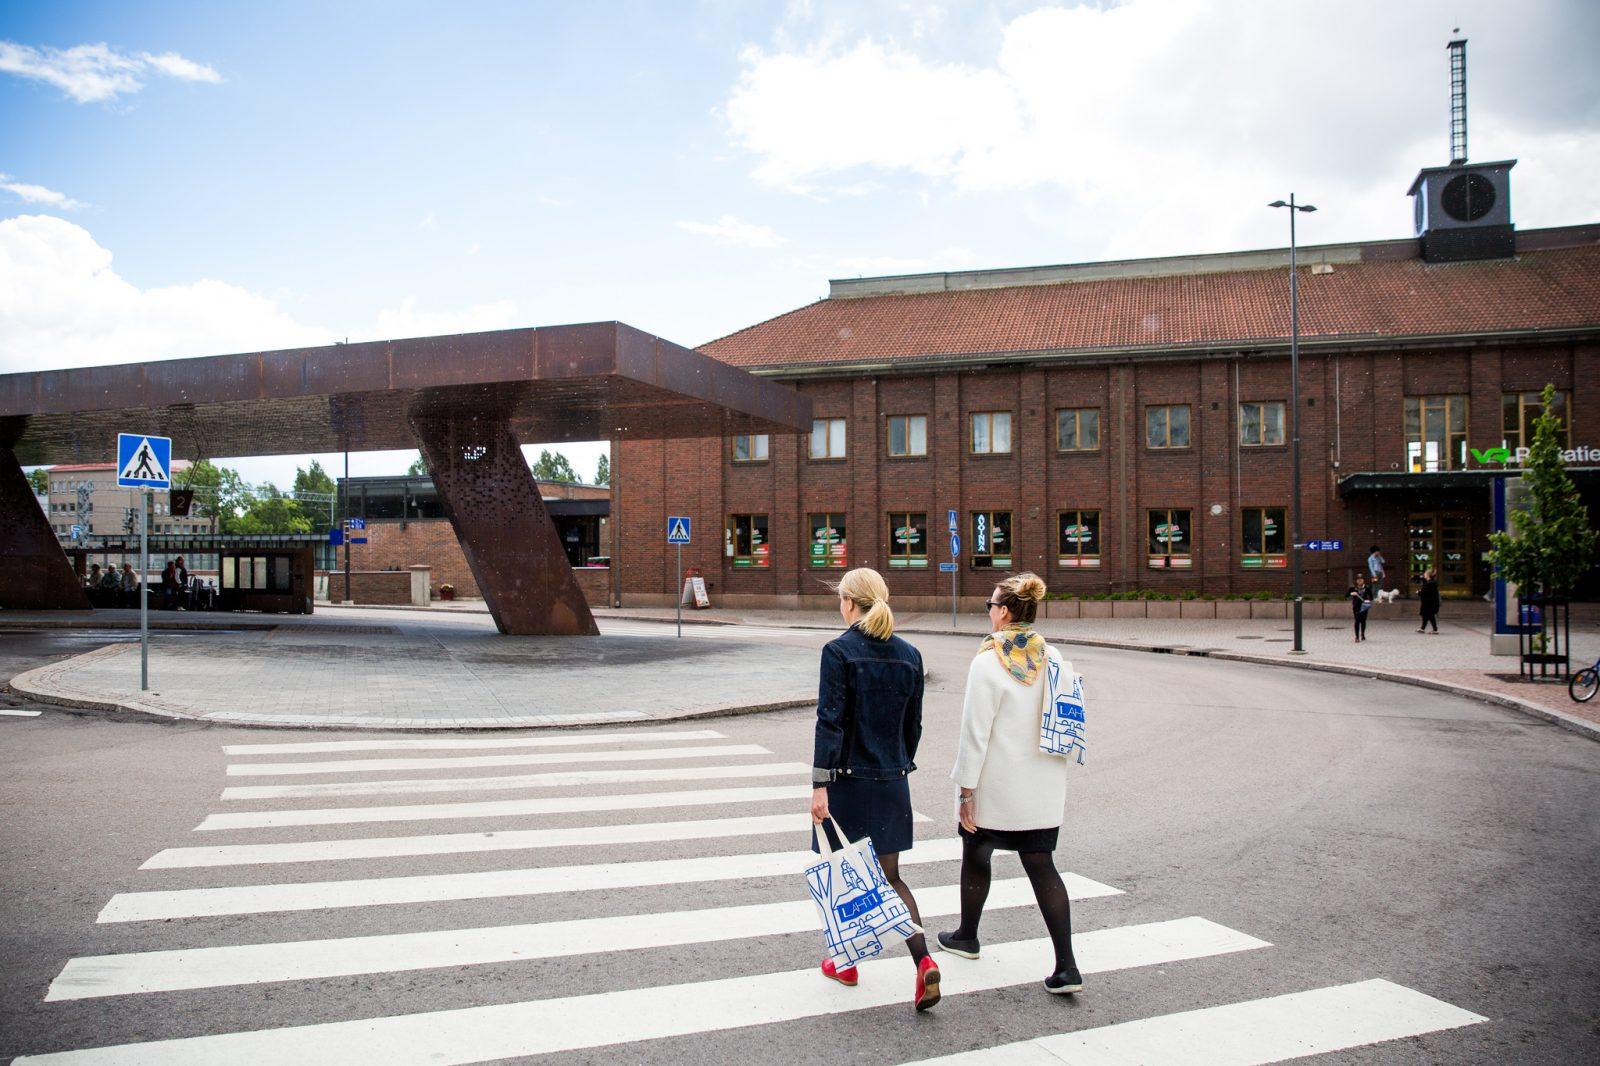 Lahden matkakeskus